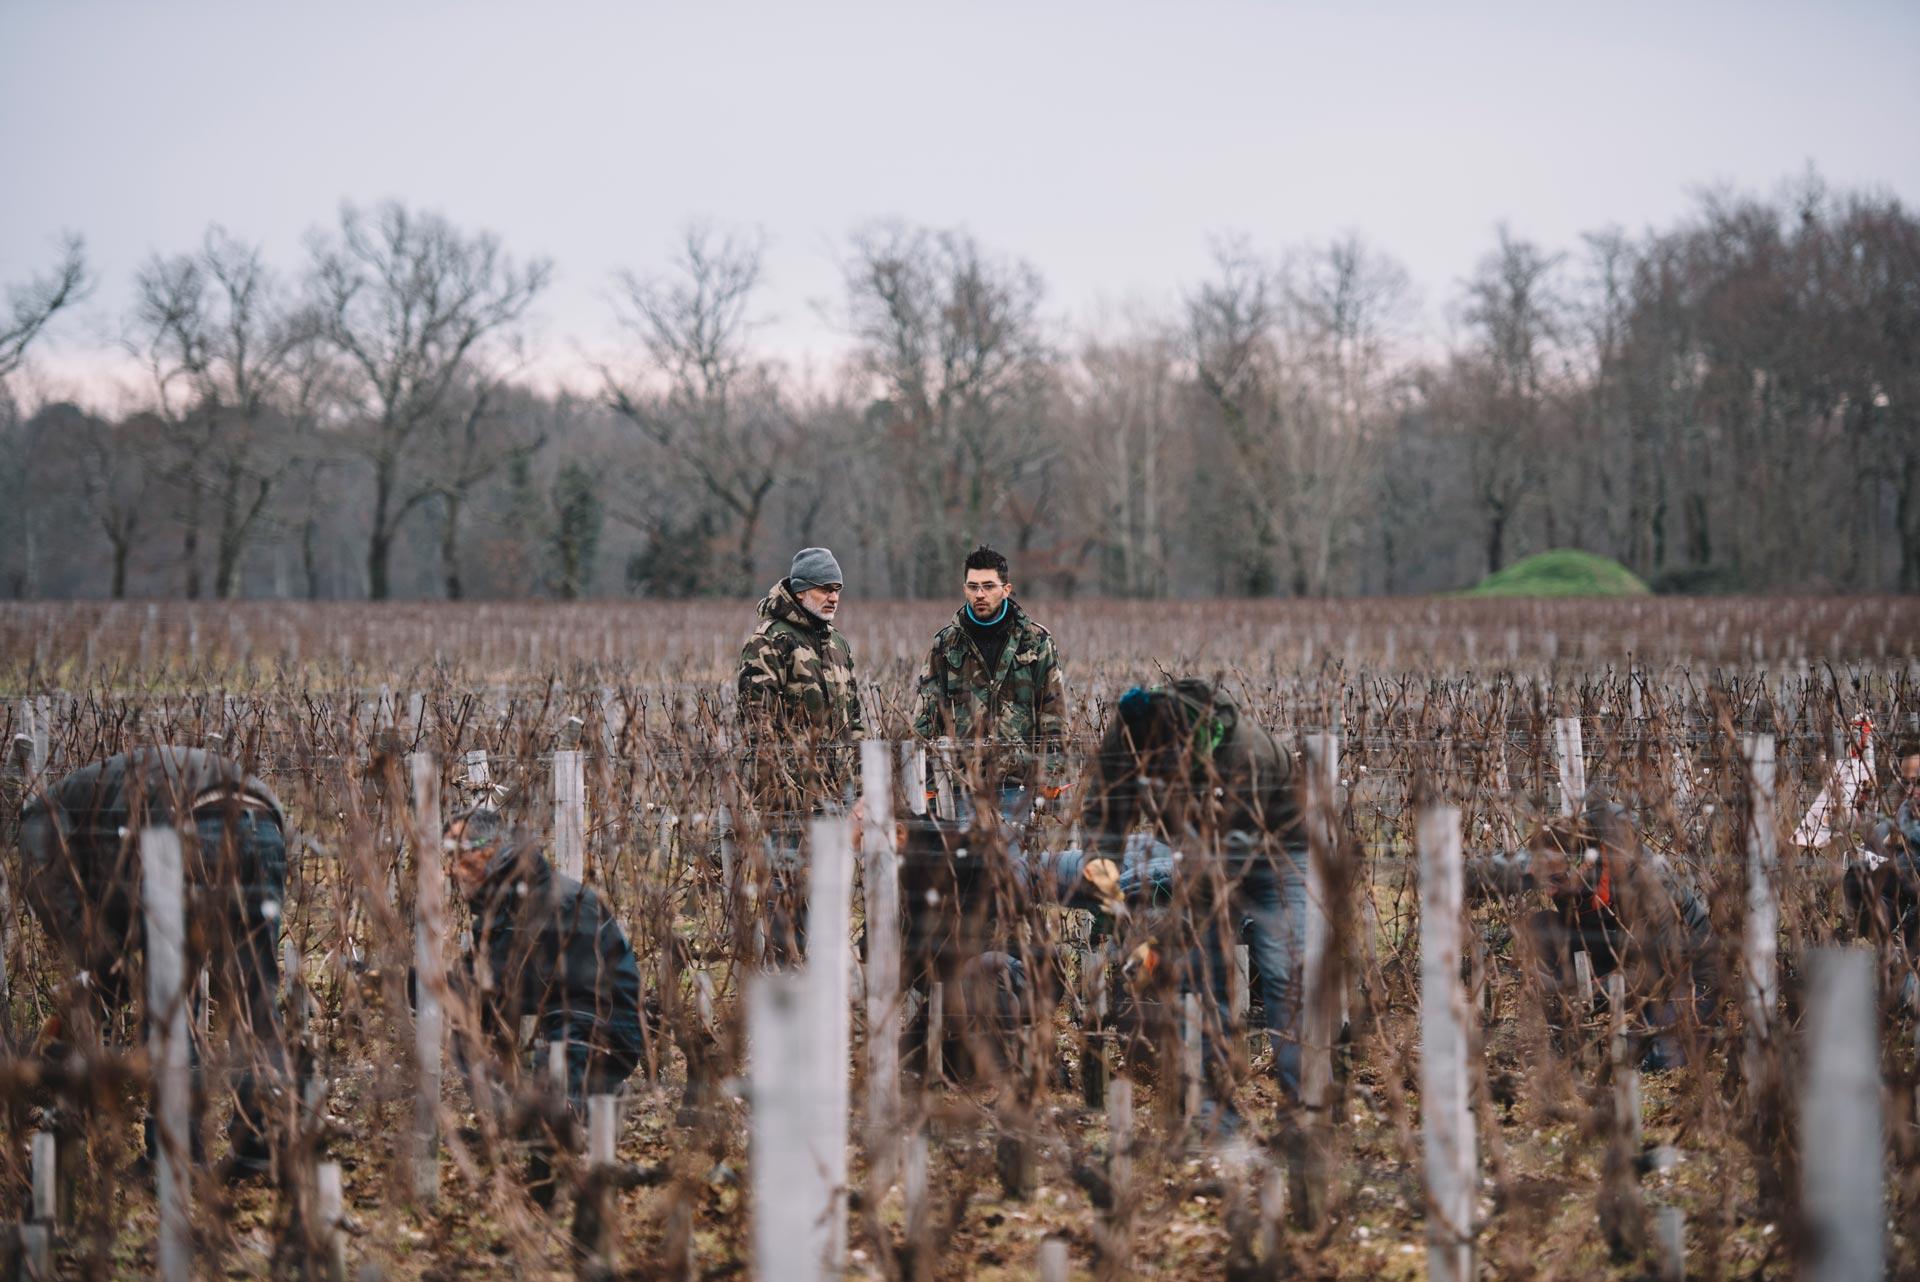 Winter training   Château Haut-Bailly   Pessac   Bordeaux